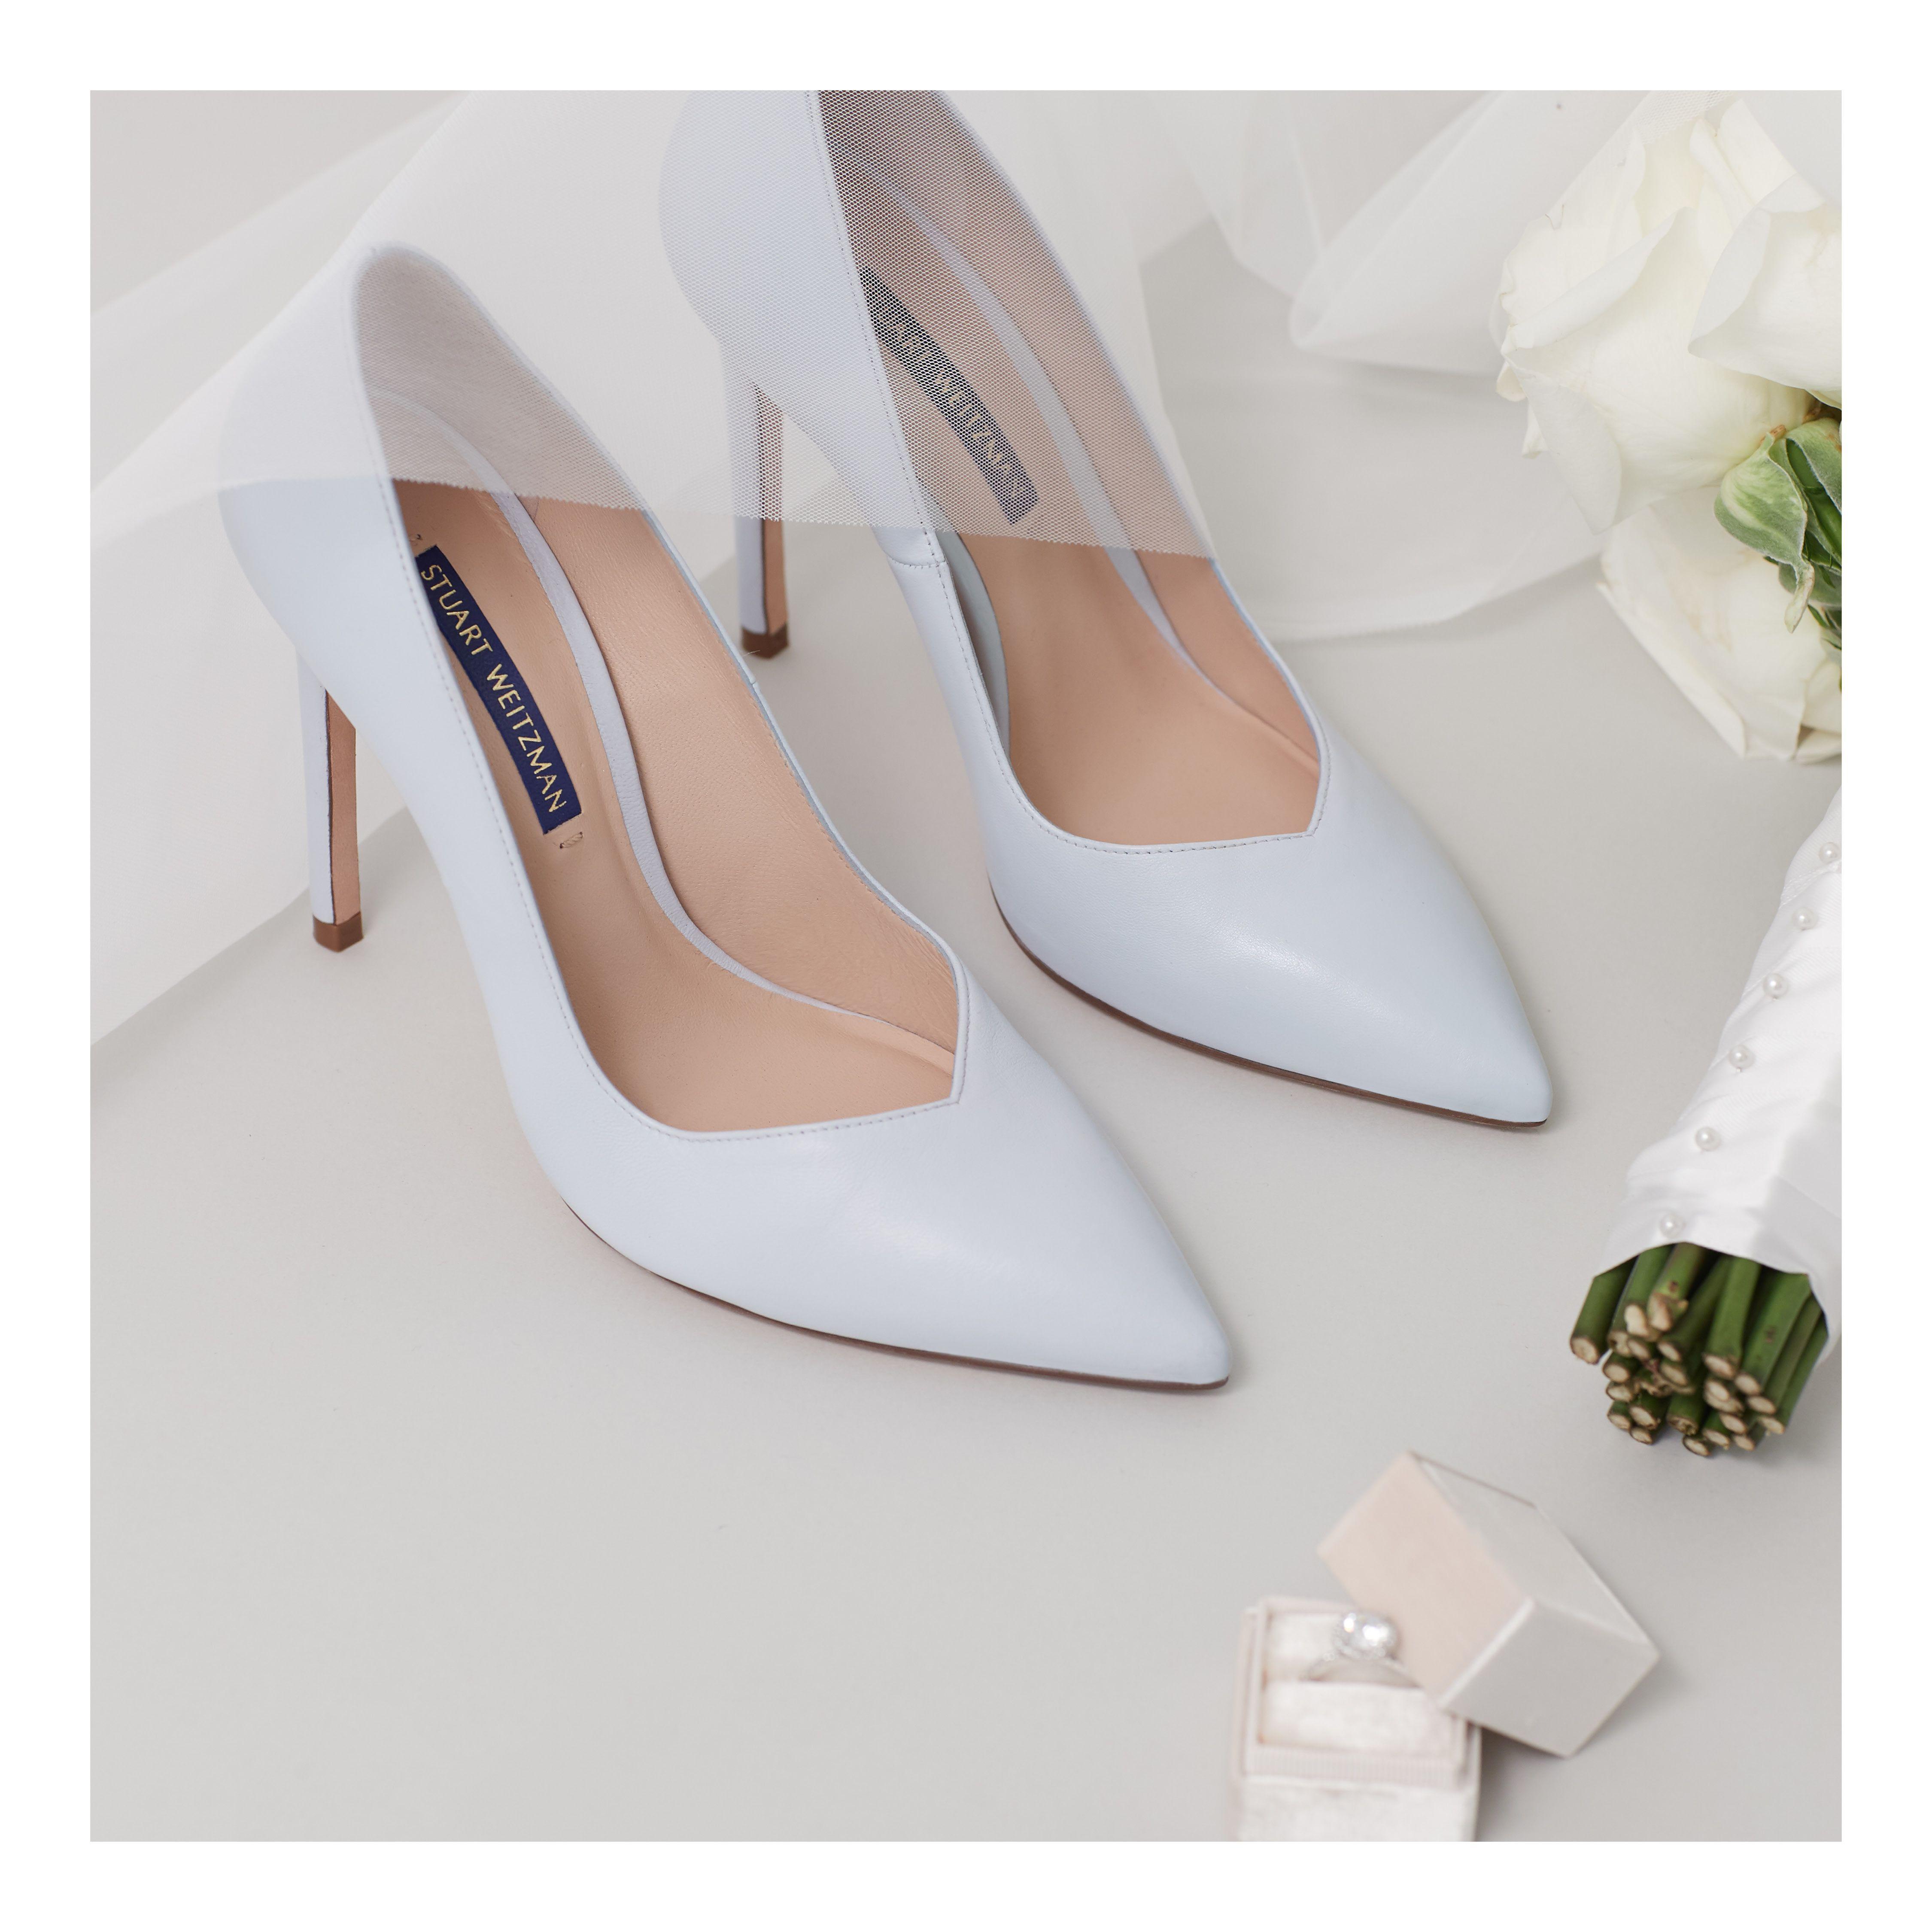 A Classic Something Blue You Can Wear Long After You Say I Do Swbridal Swwomen Stuartweitzman Bridal Shoes Pumps Heels Stuart Weitzman